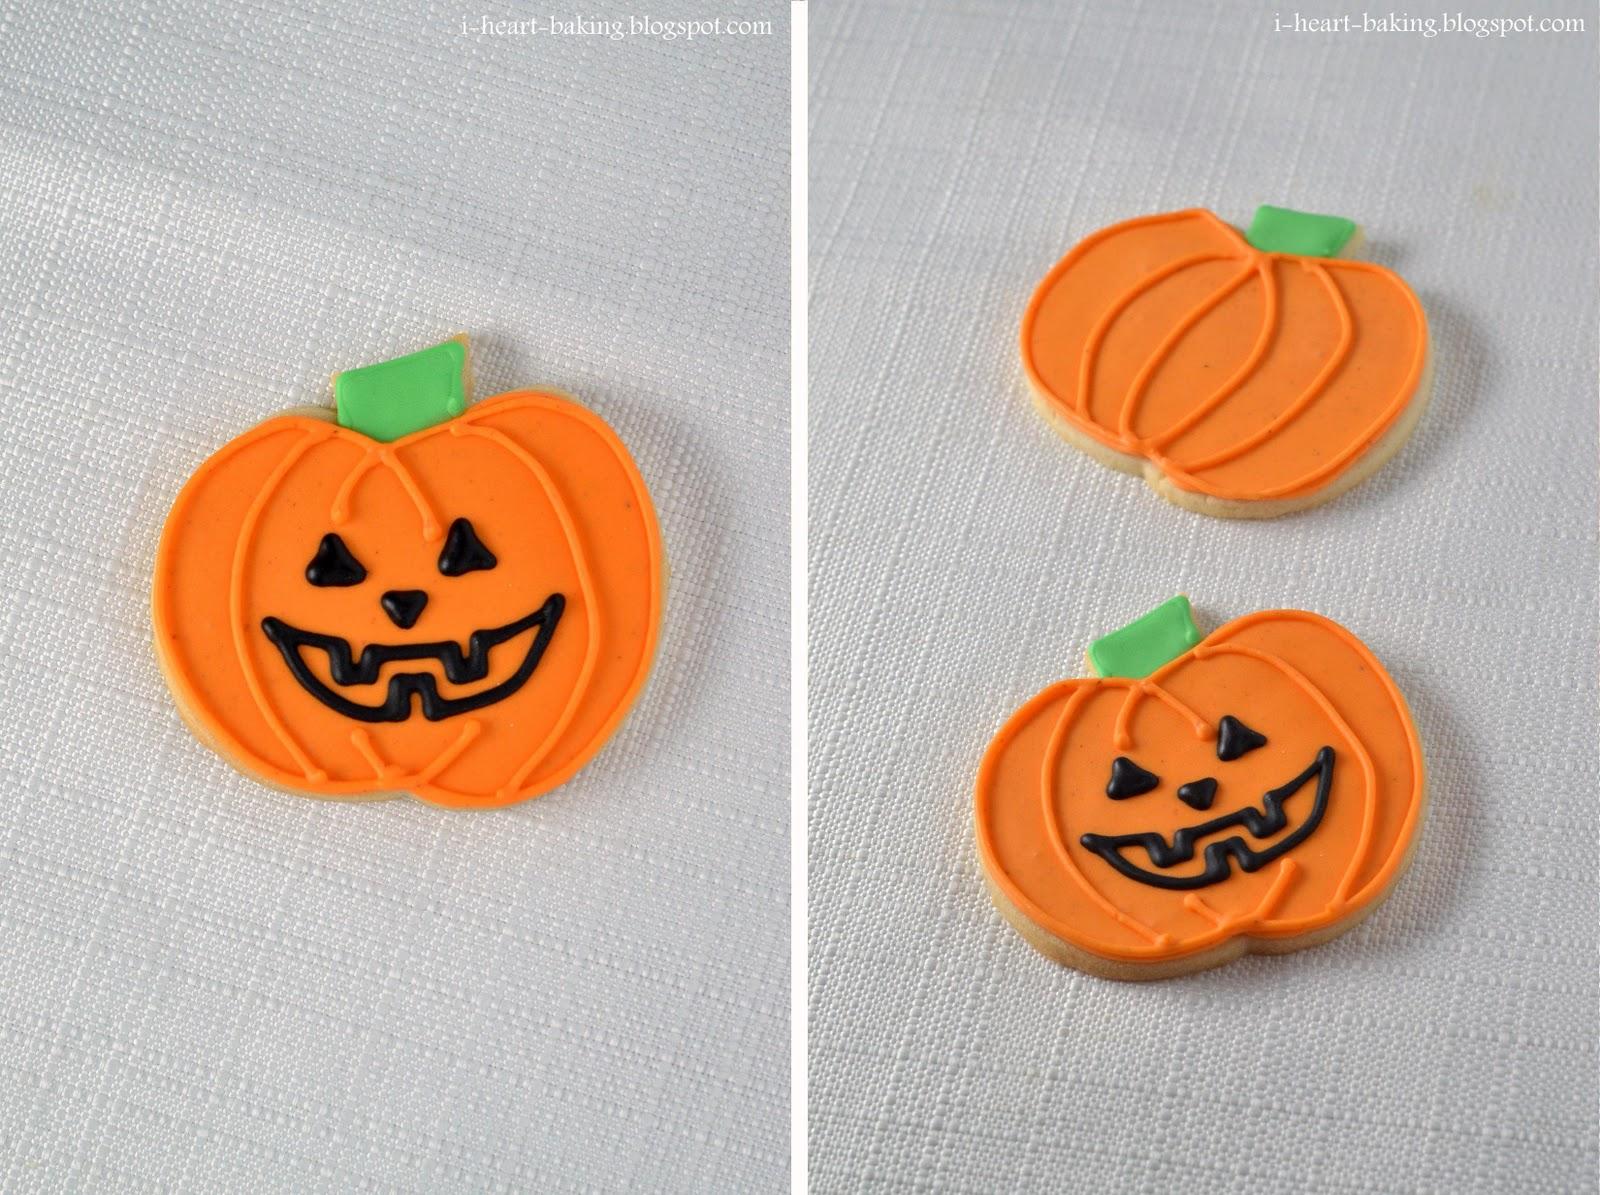 jack-o-lantern faces, I decided to make cookie replicas of the jack-o ...